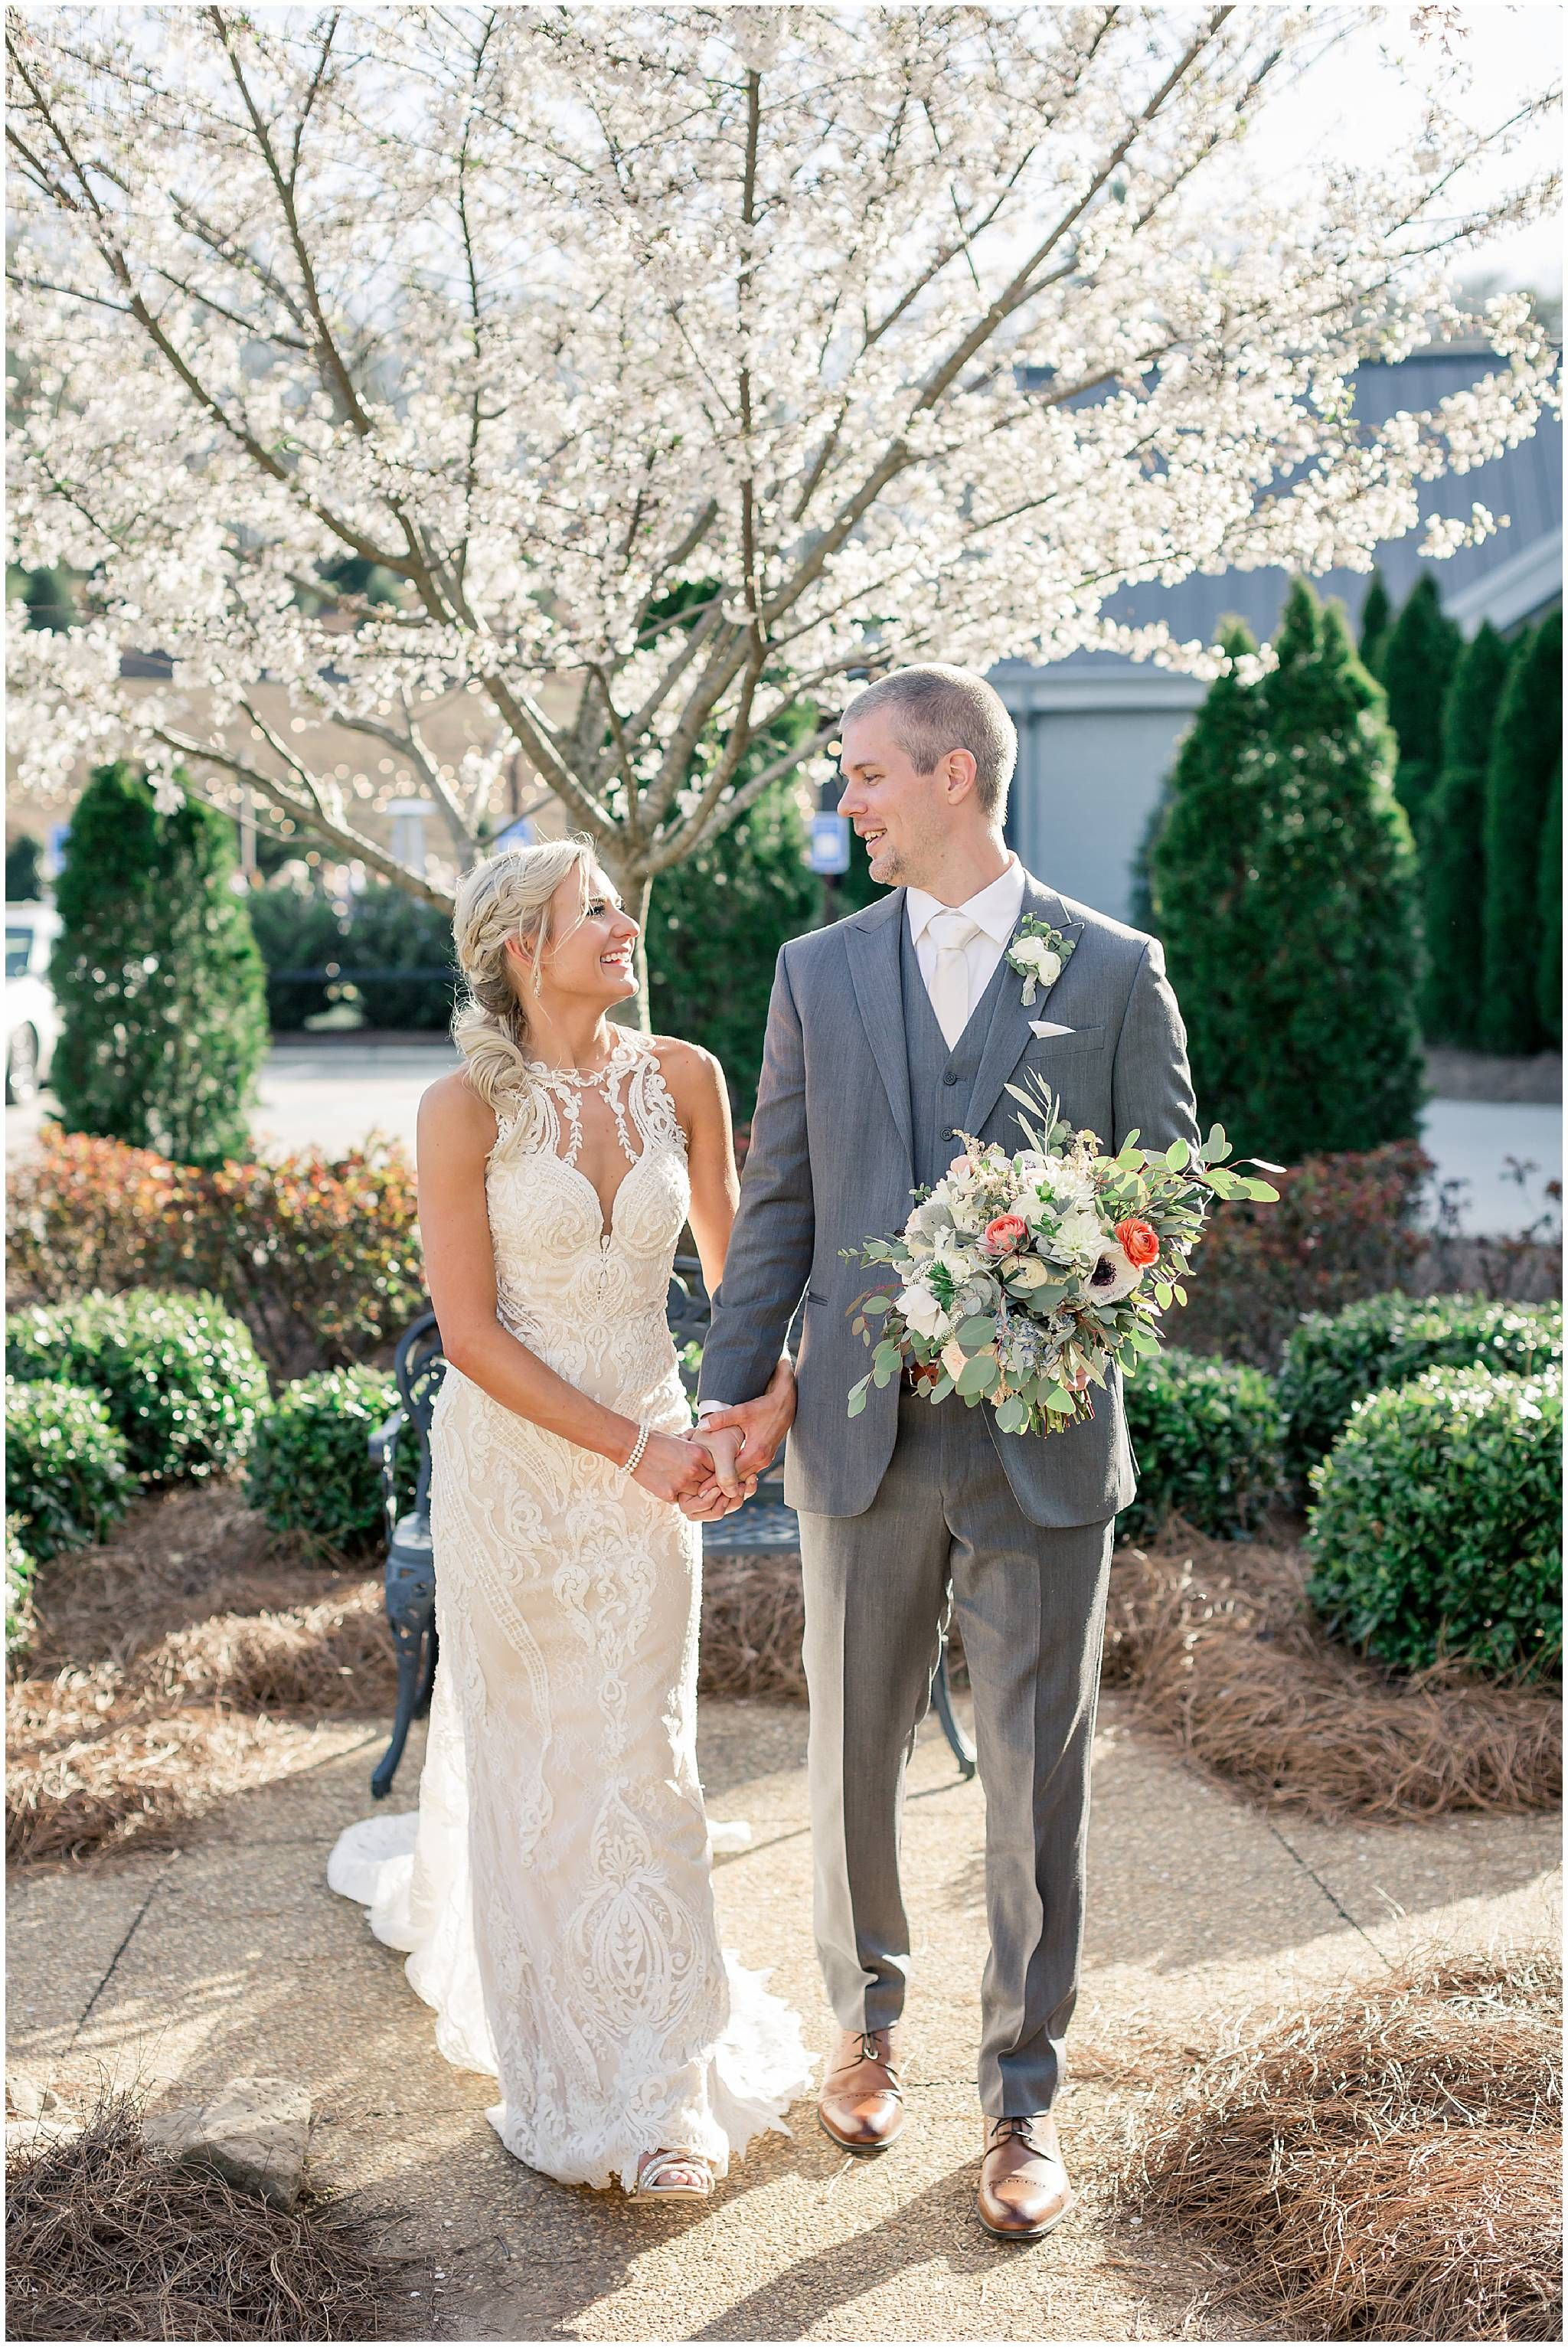 Katie & Brett's Yonah Mountain Vineyard Wedding Vineyard